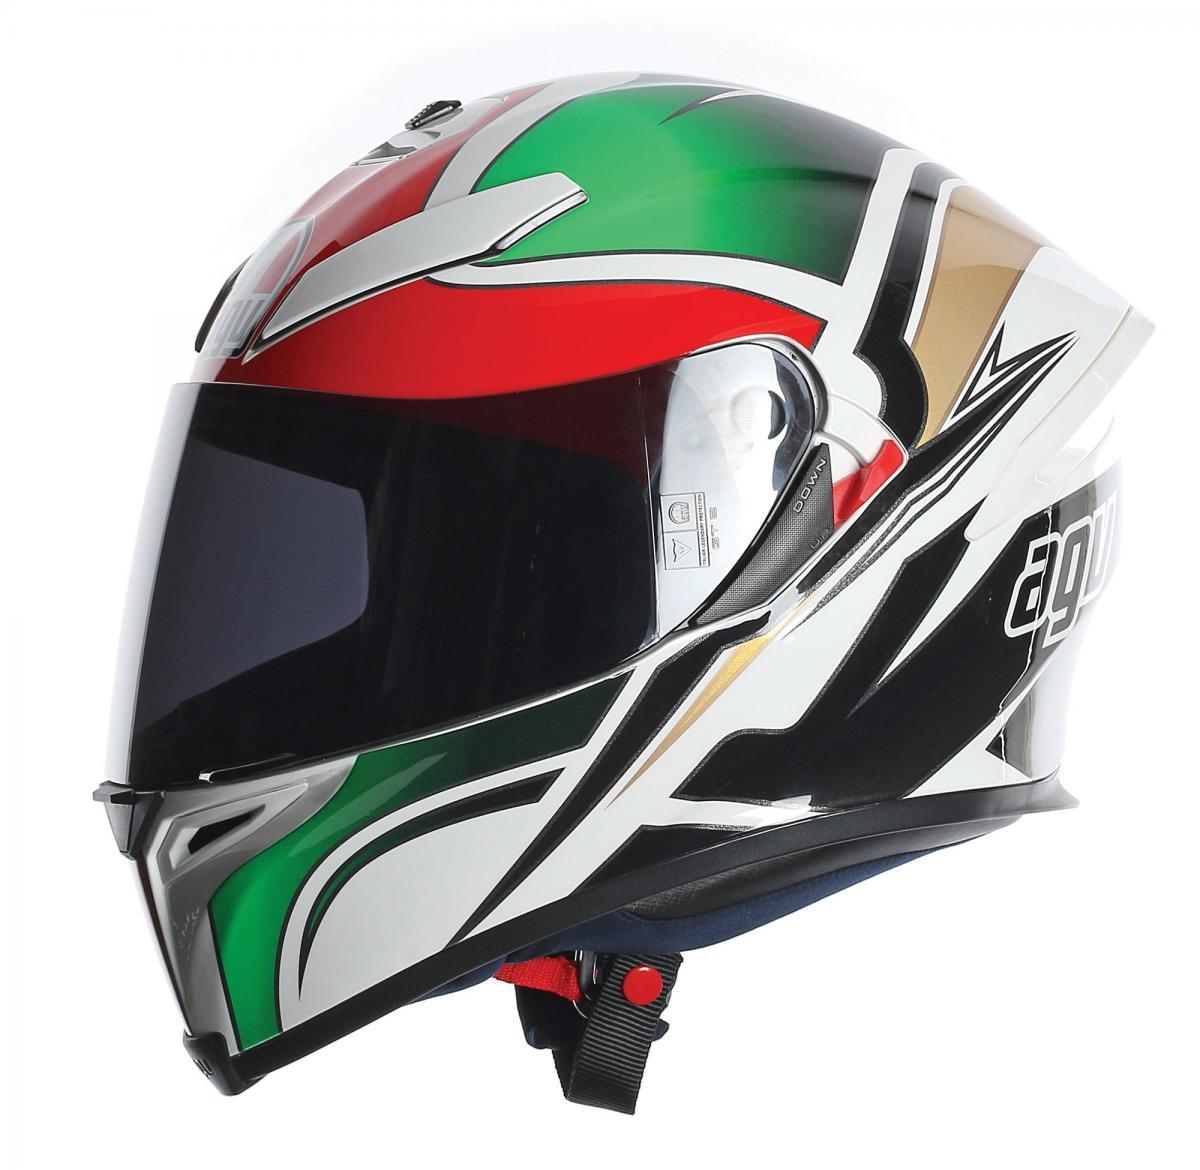 Agv K5 Roadracer Italy Agv K5 Roadracer Italy 499 00